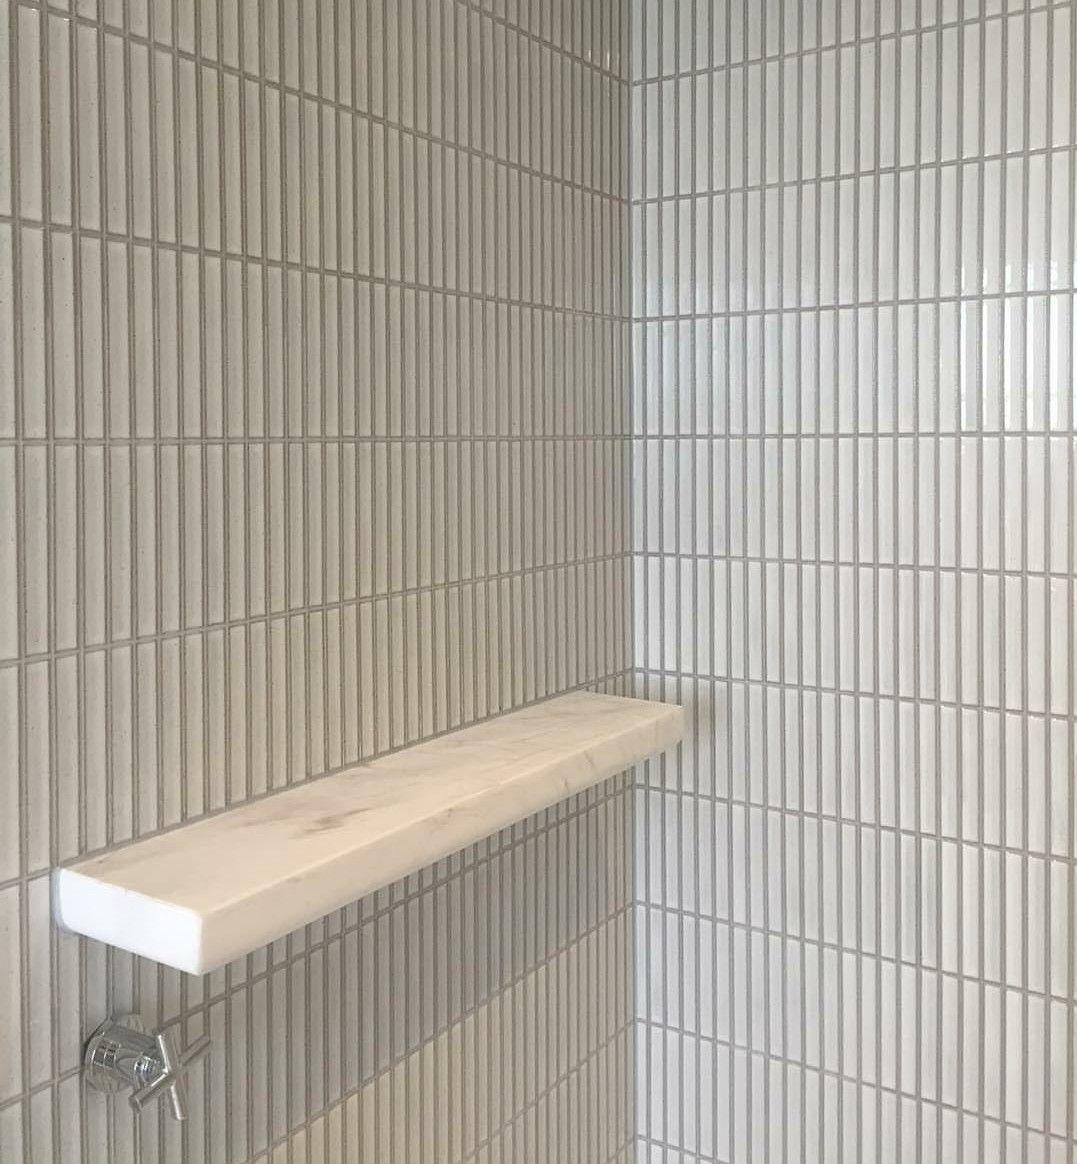 INAX yuki border tiles | salle de bain | Pinterest | Border tiles ...